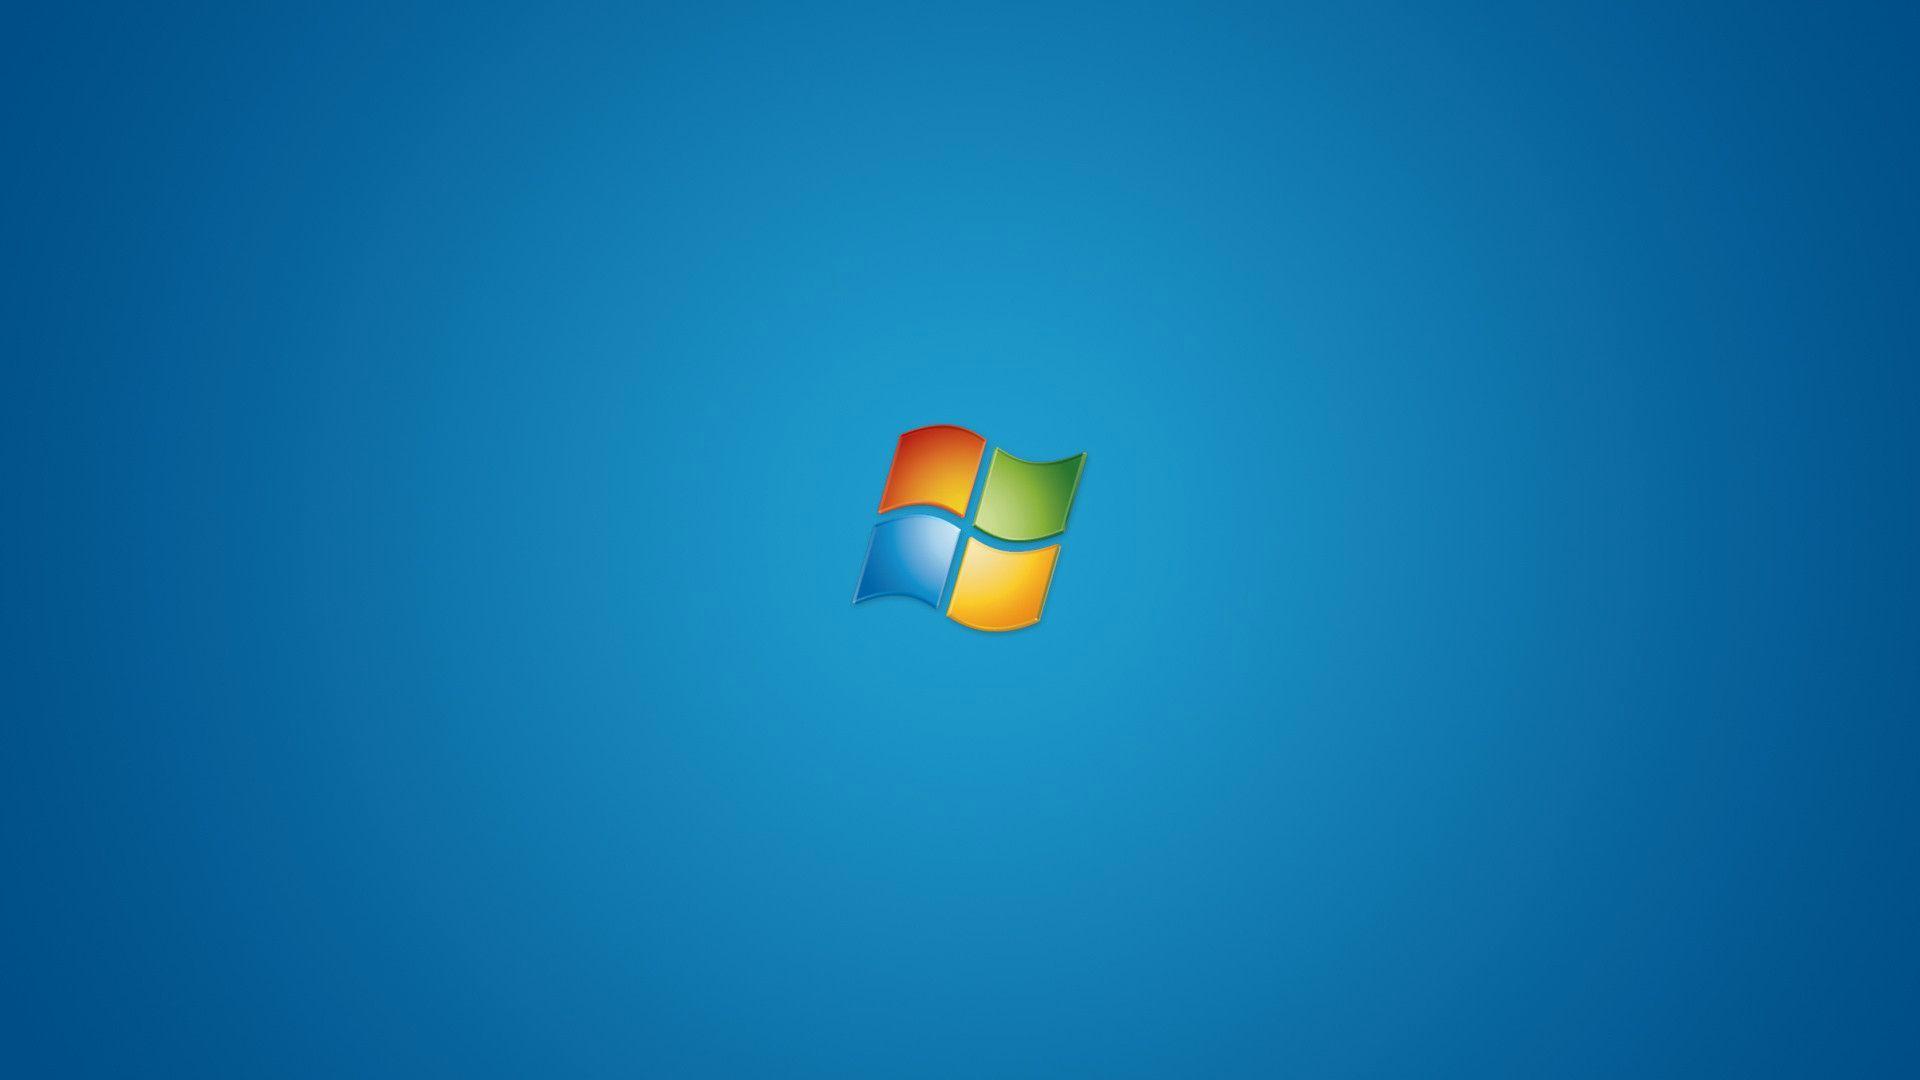 Microsoft Office Wallpaper 04 1920x1080